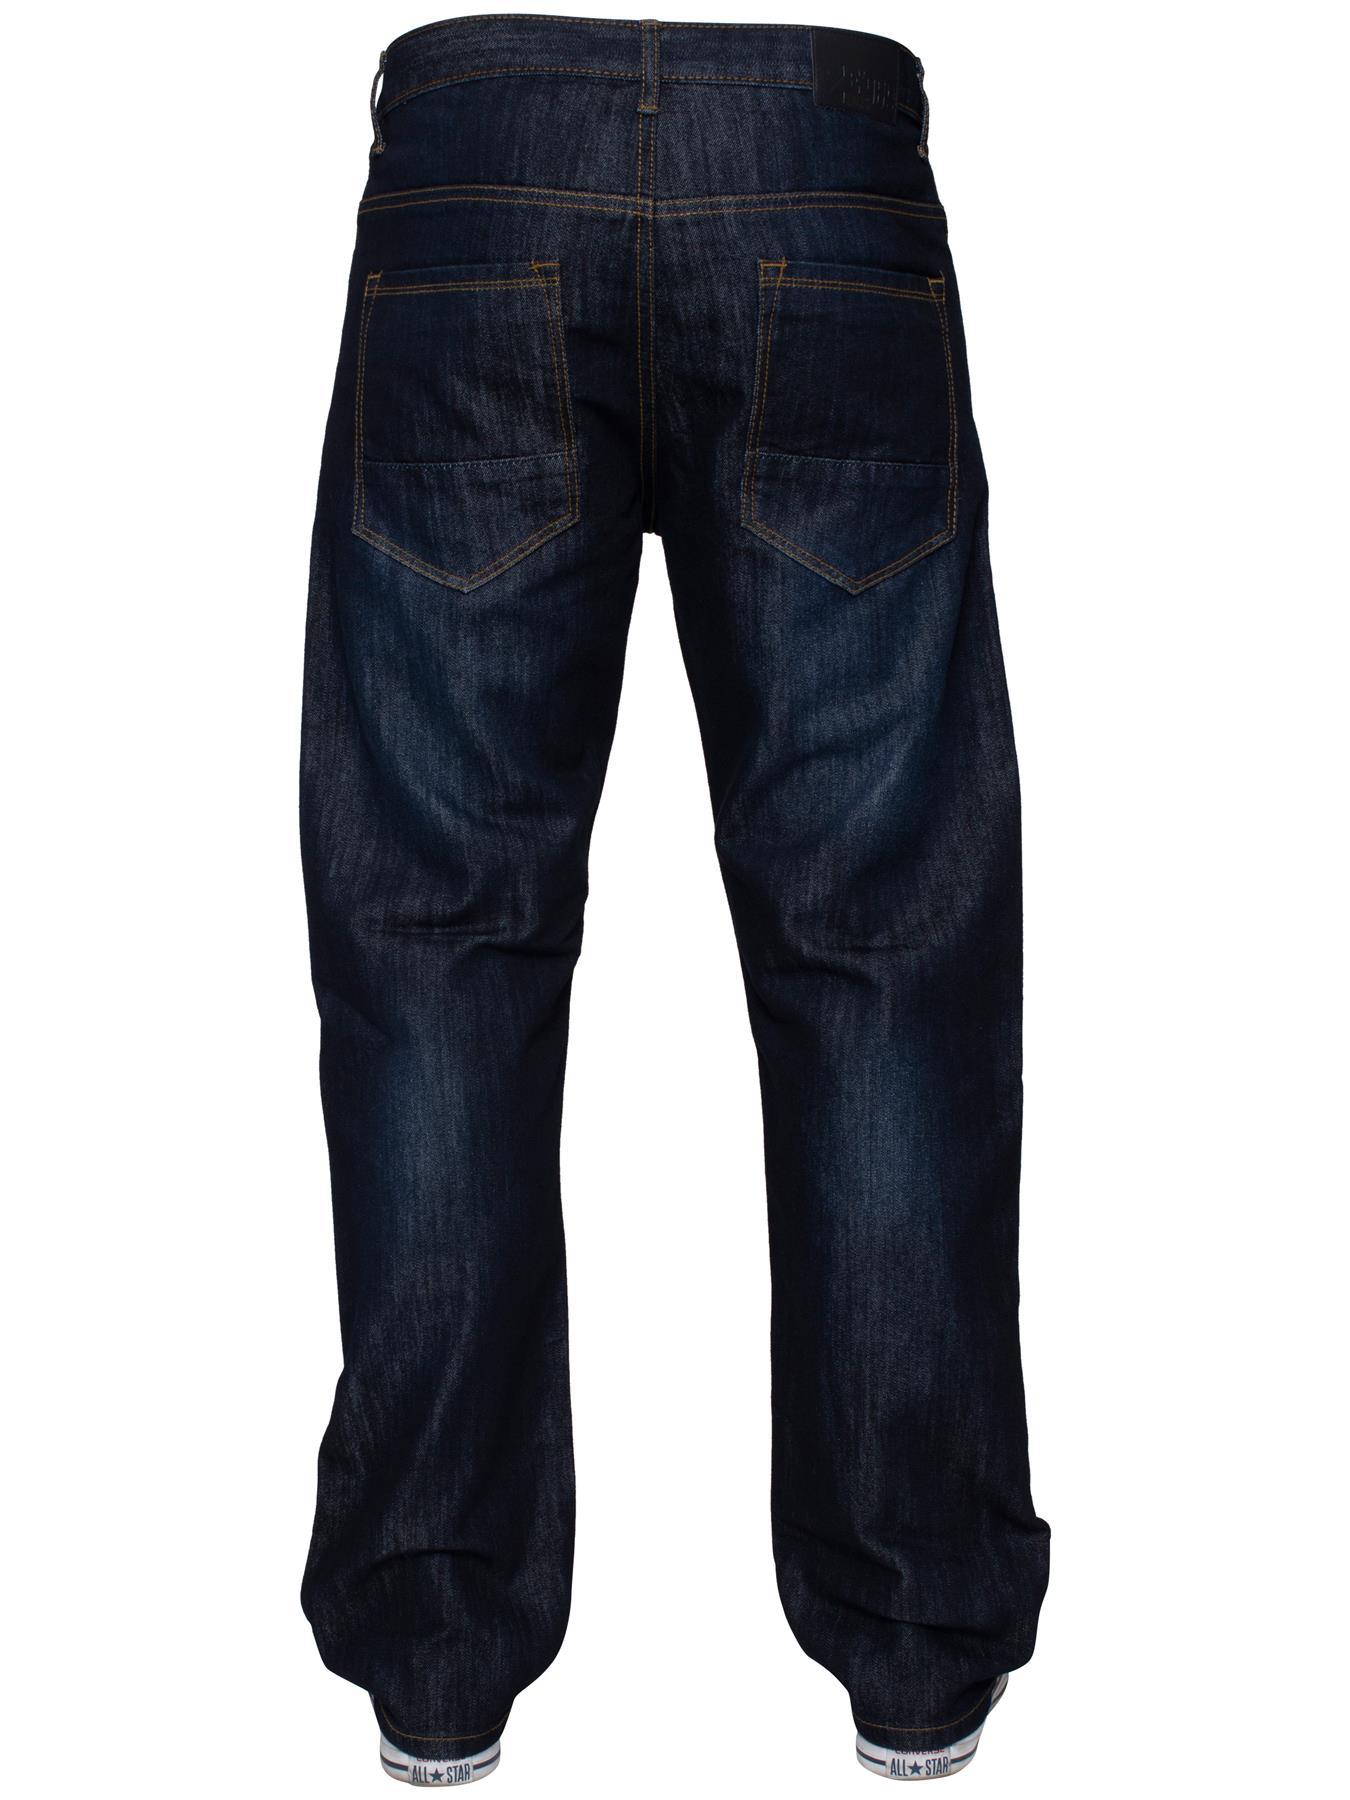 Mens-Regular-Fit-Jeans-Straight-Leg-Denim-Pants-Trousers-Pants-All-Waist-Sizes thumbnail 21